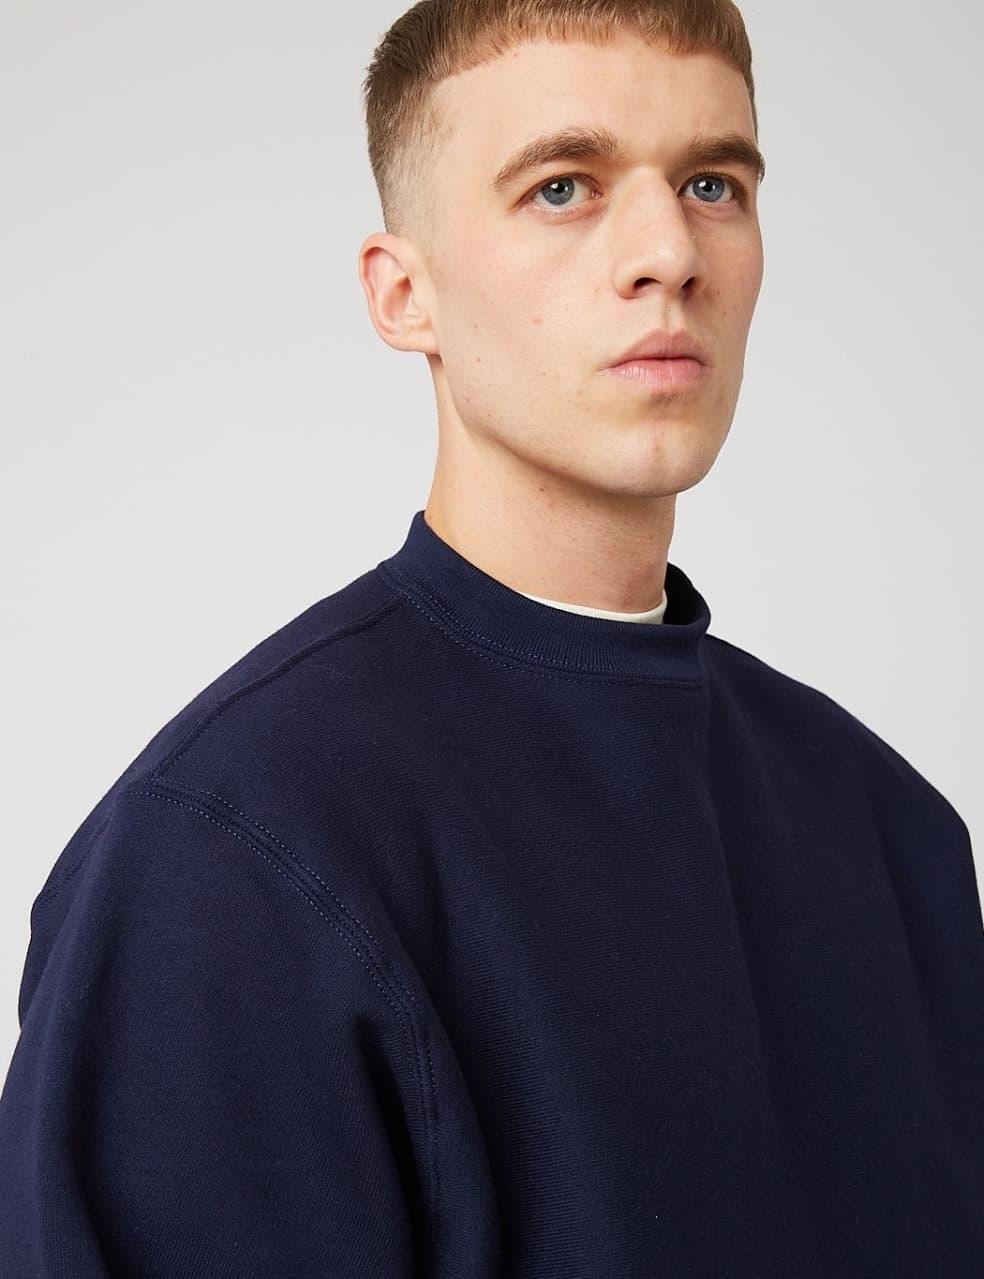 Camber Crew Neck Sweatshirt (12oz) - Navy Blue | Sweatshirt by Camber USA 3